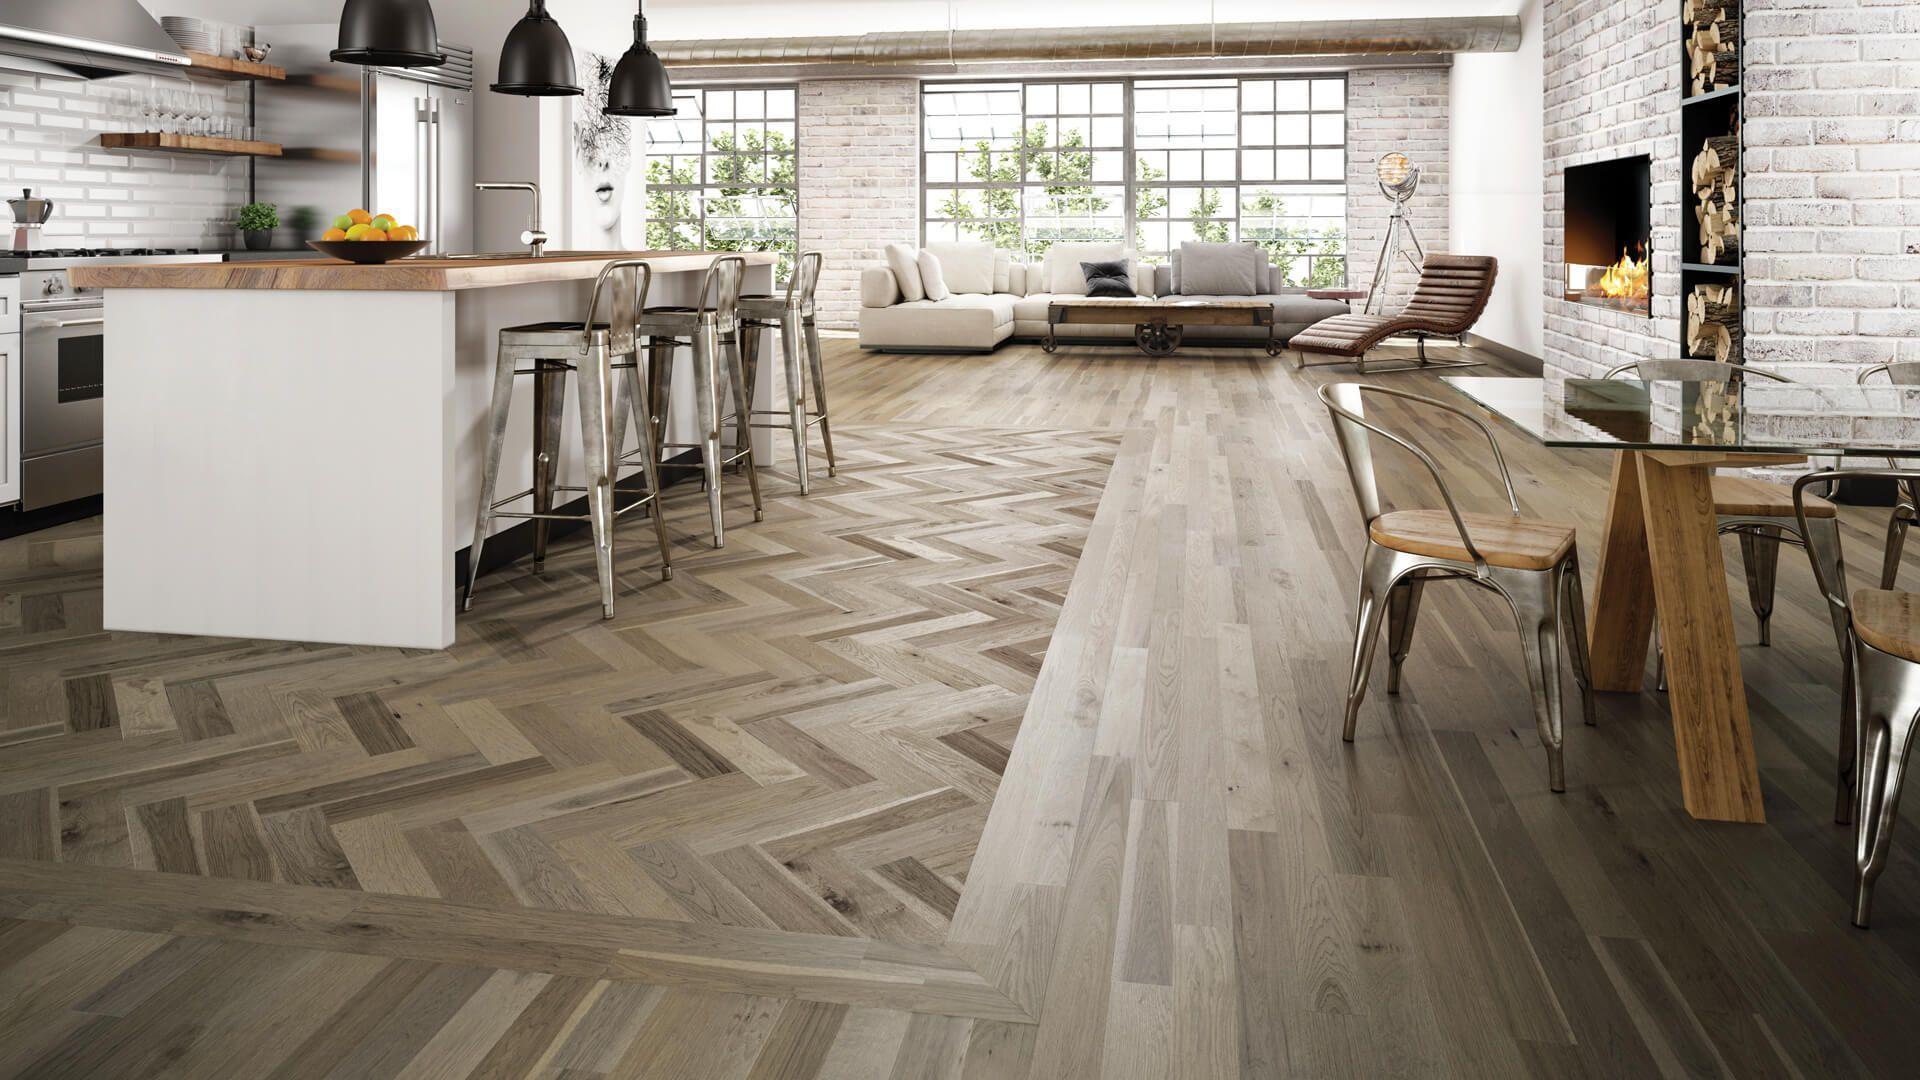 15 Mind Blowing Kitchen Flooring Ideas Photos And Galleries Flooring Galleries Ideas Kit In 2020 Hardwood In Kitchen Hardwood Floors In Kitchen Best Wood Flooring